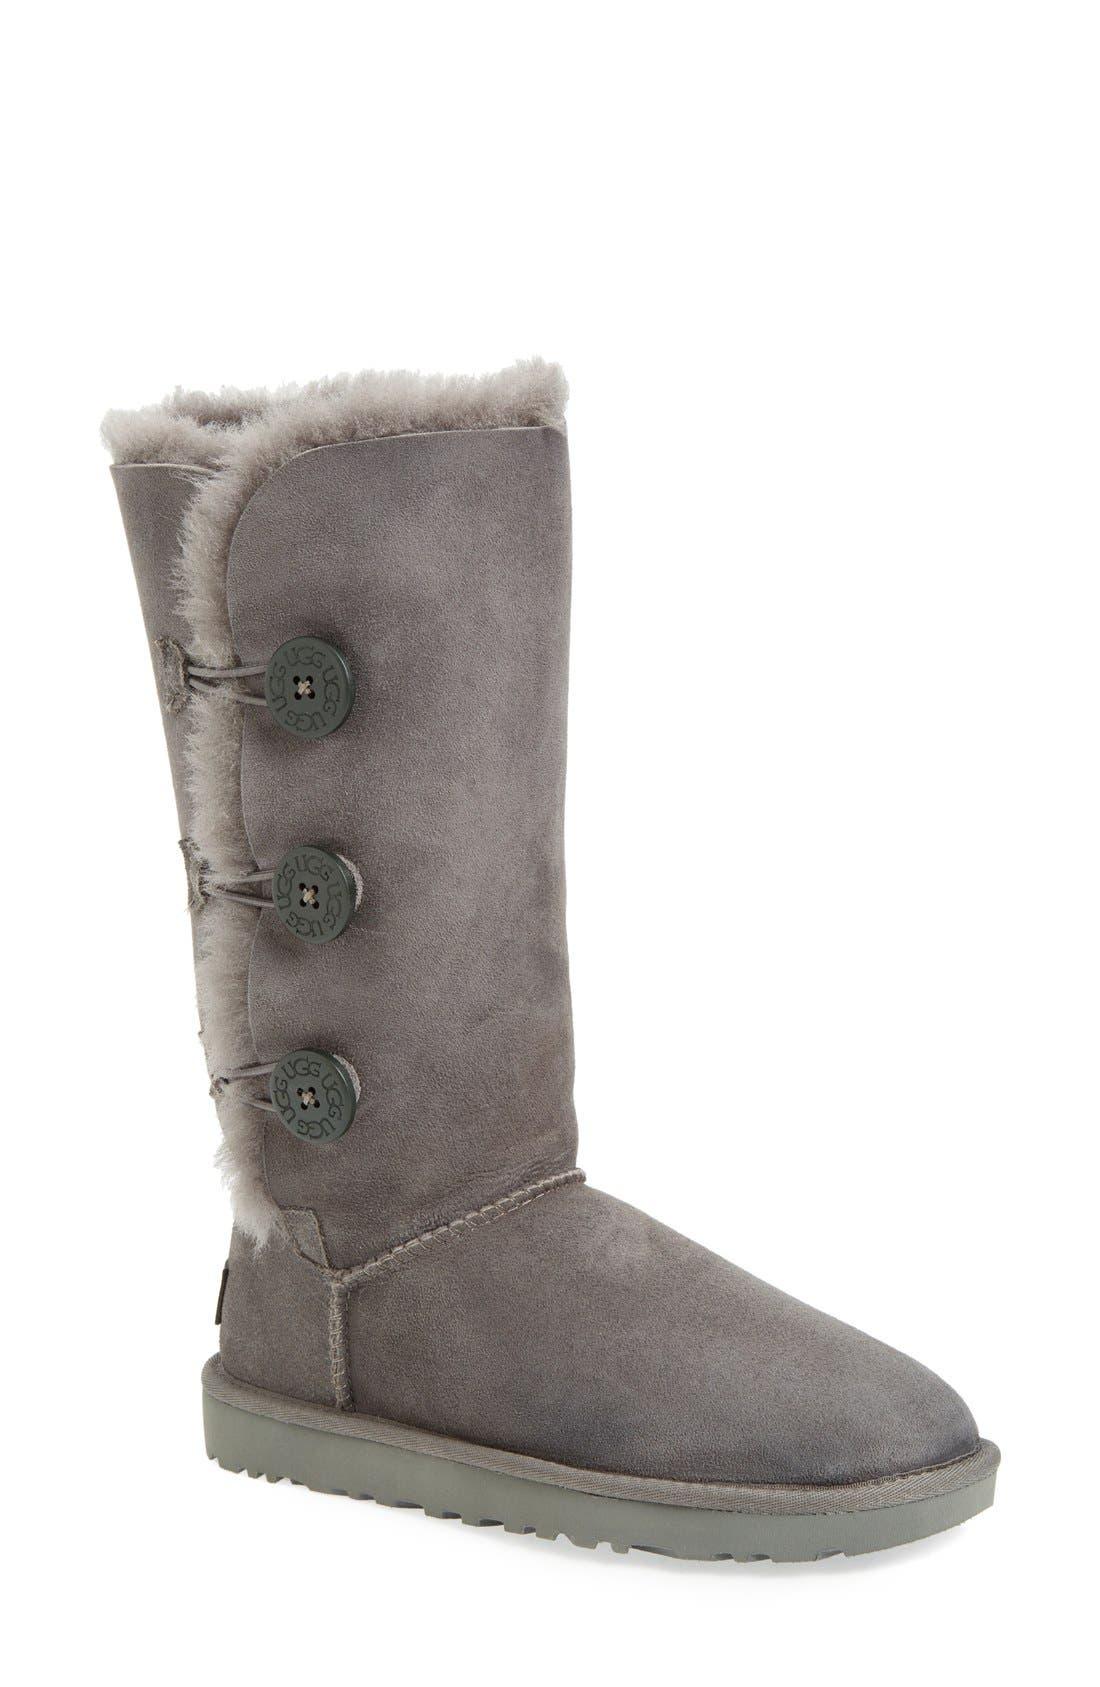 Ugg Bailey Button Triplet Ii Genuine Shearling Boot